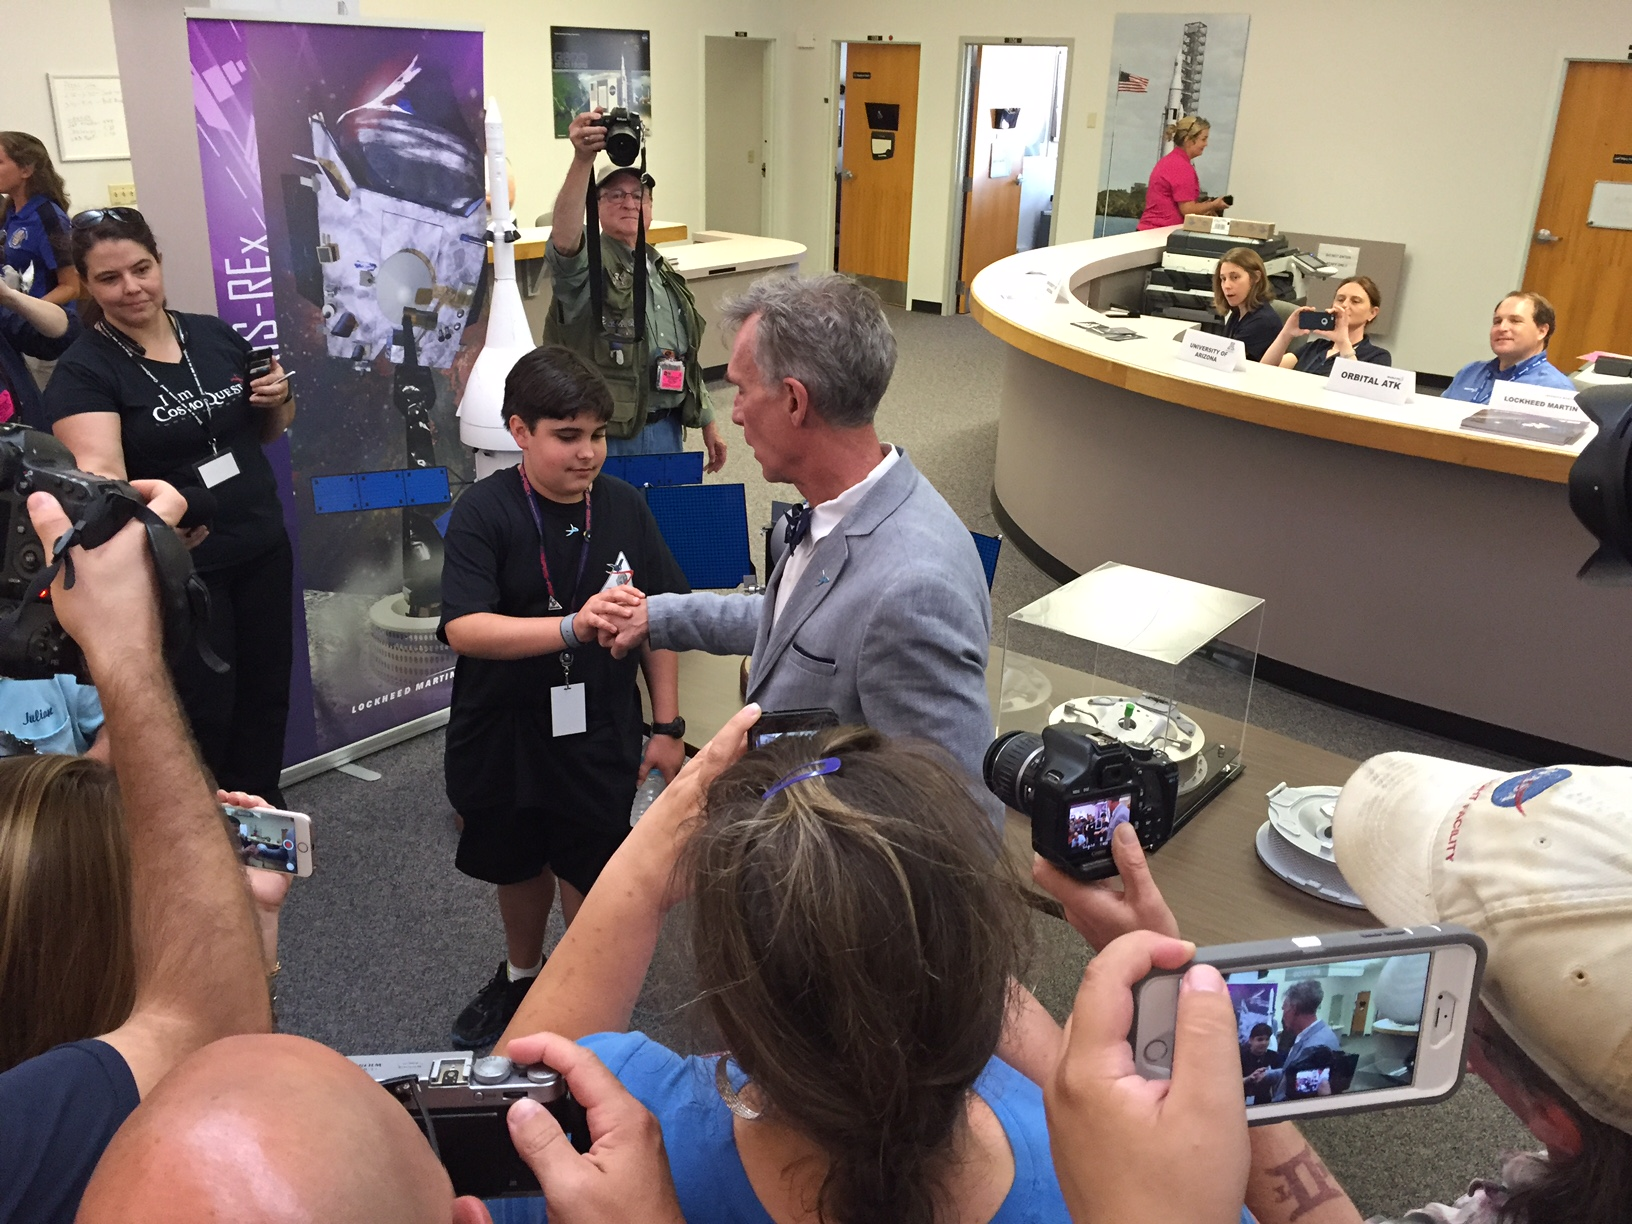 Bill Nye and Mike Puzio Do OSIRIS-REx High-Five